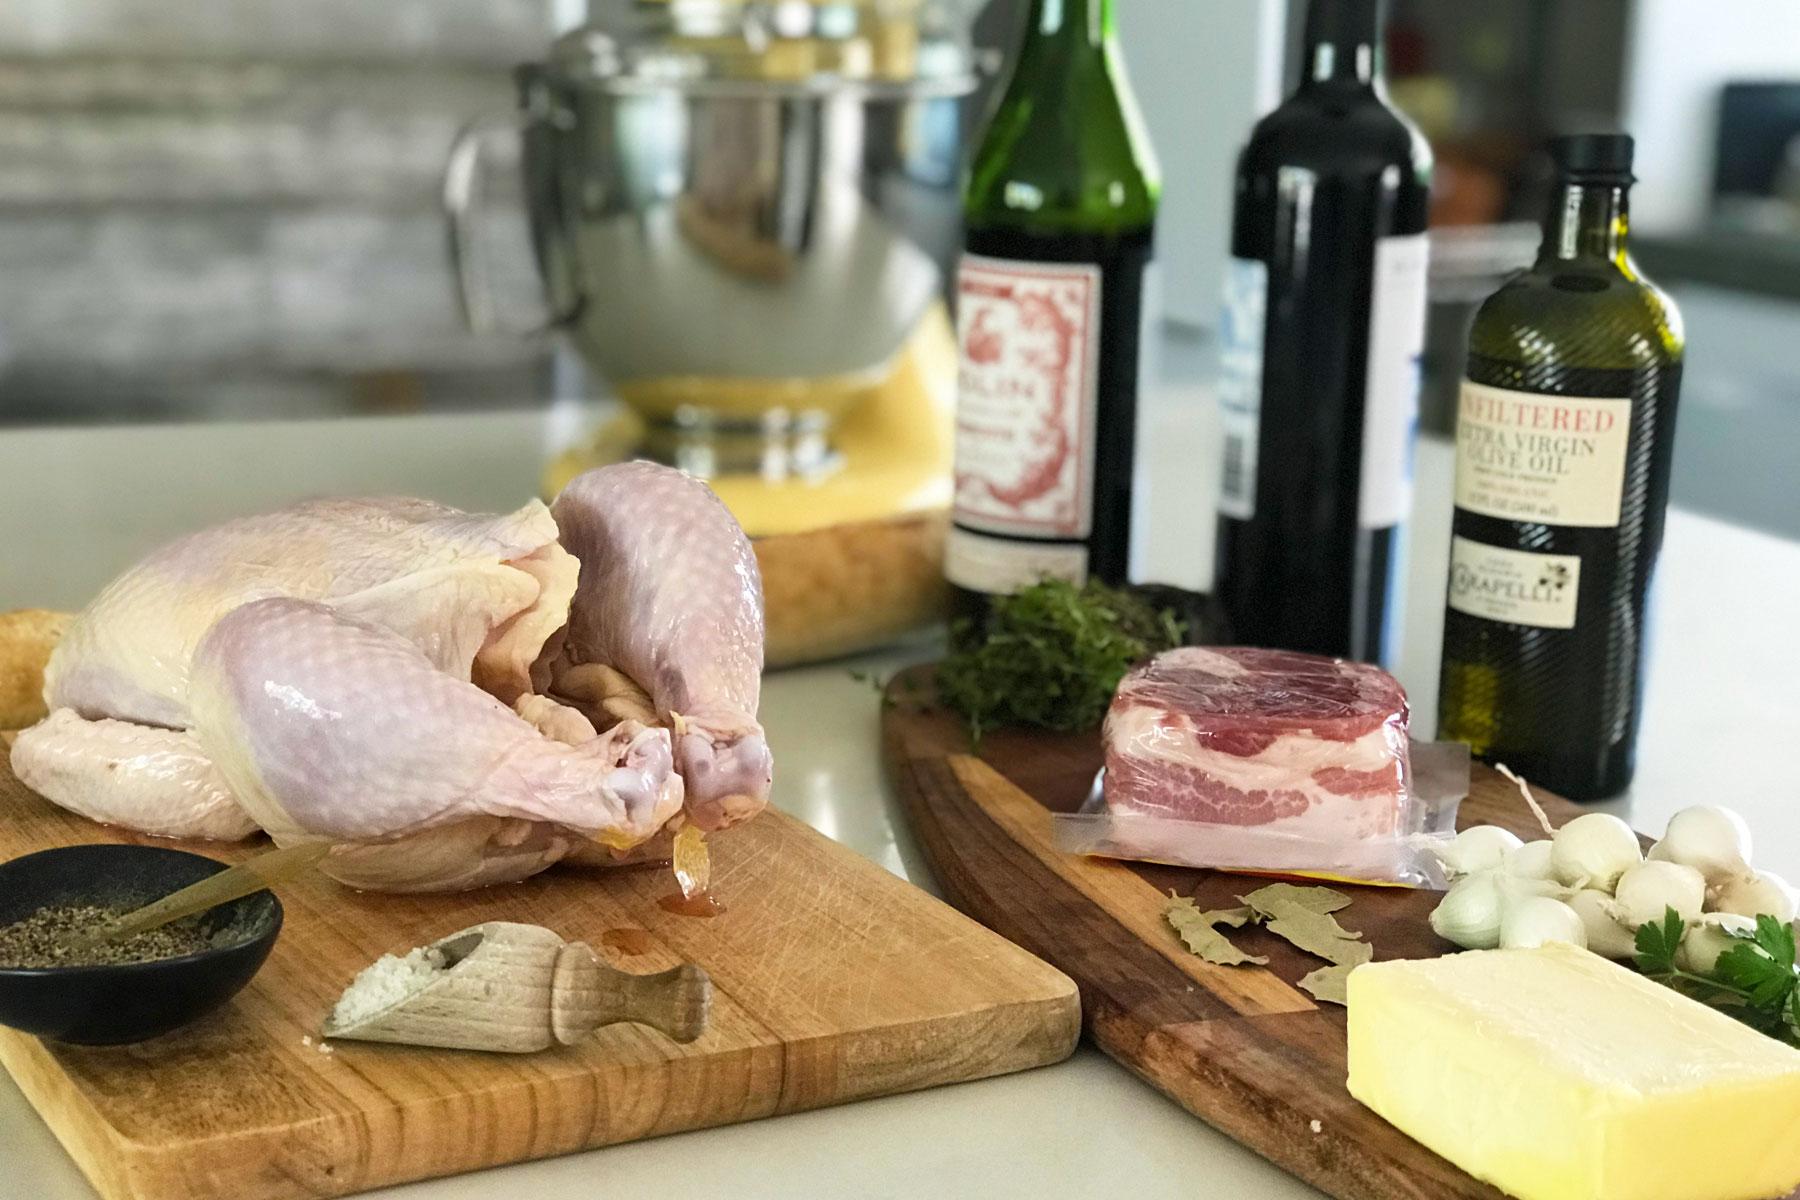 Andrea s ingredients for coq au vin